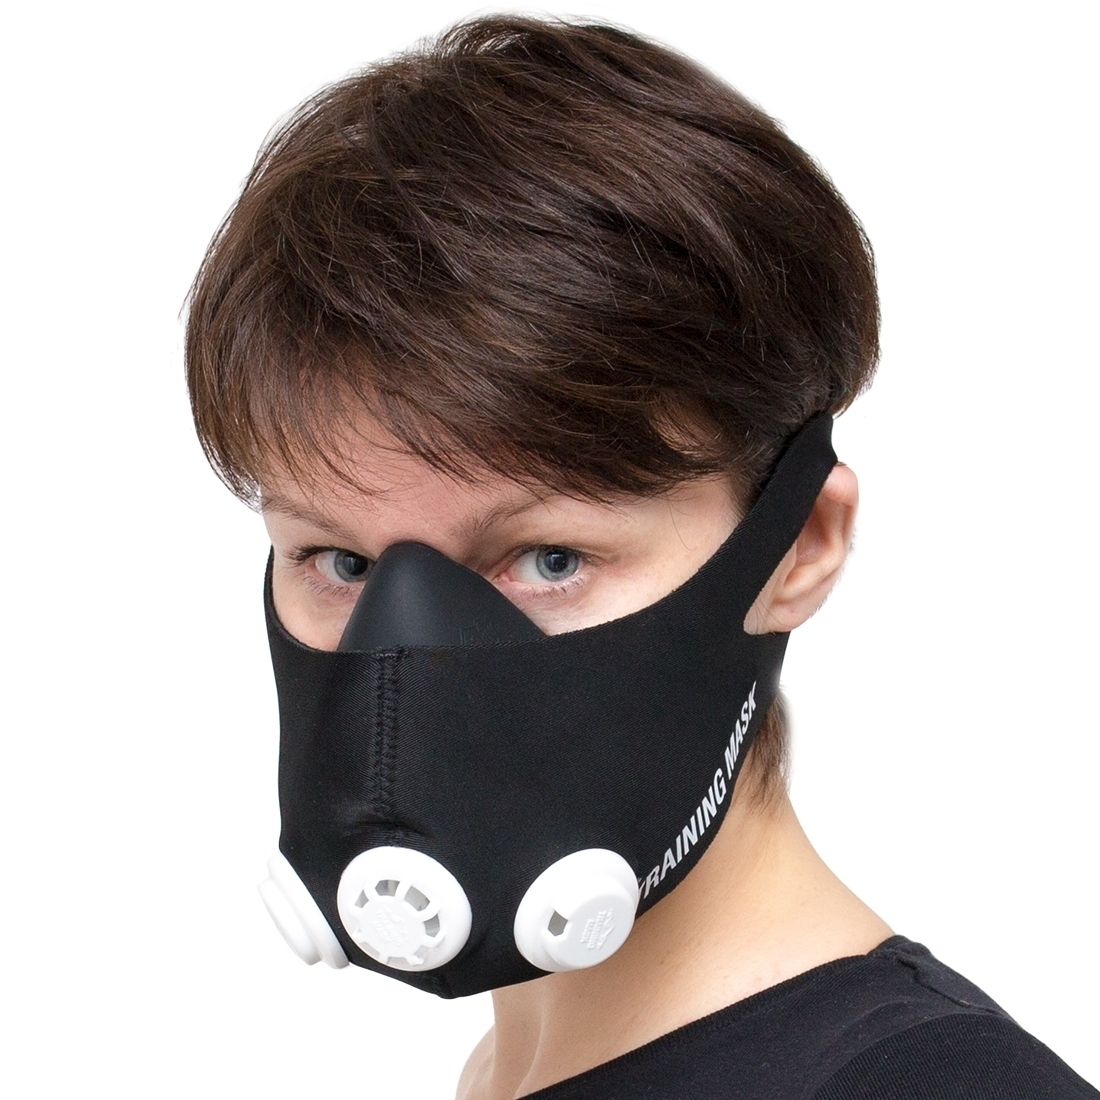 Новинки Тренировочная маска Training Mask 2.0 training-maska.jpg